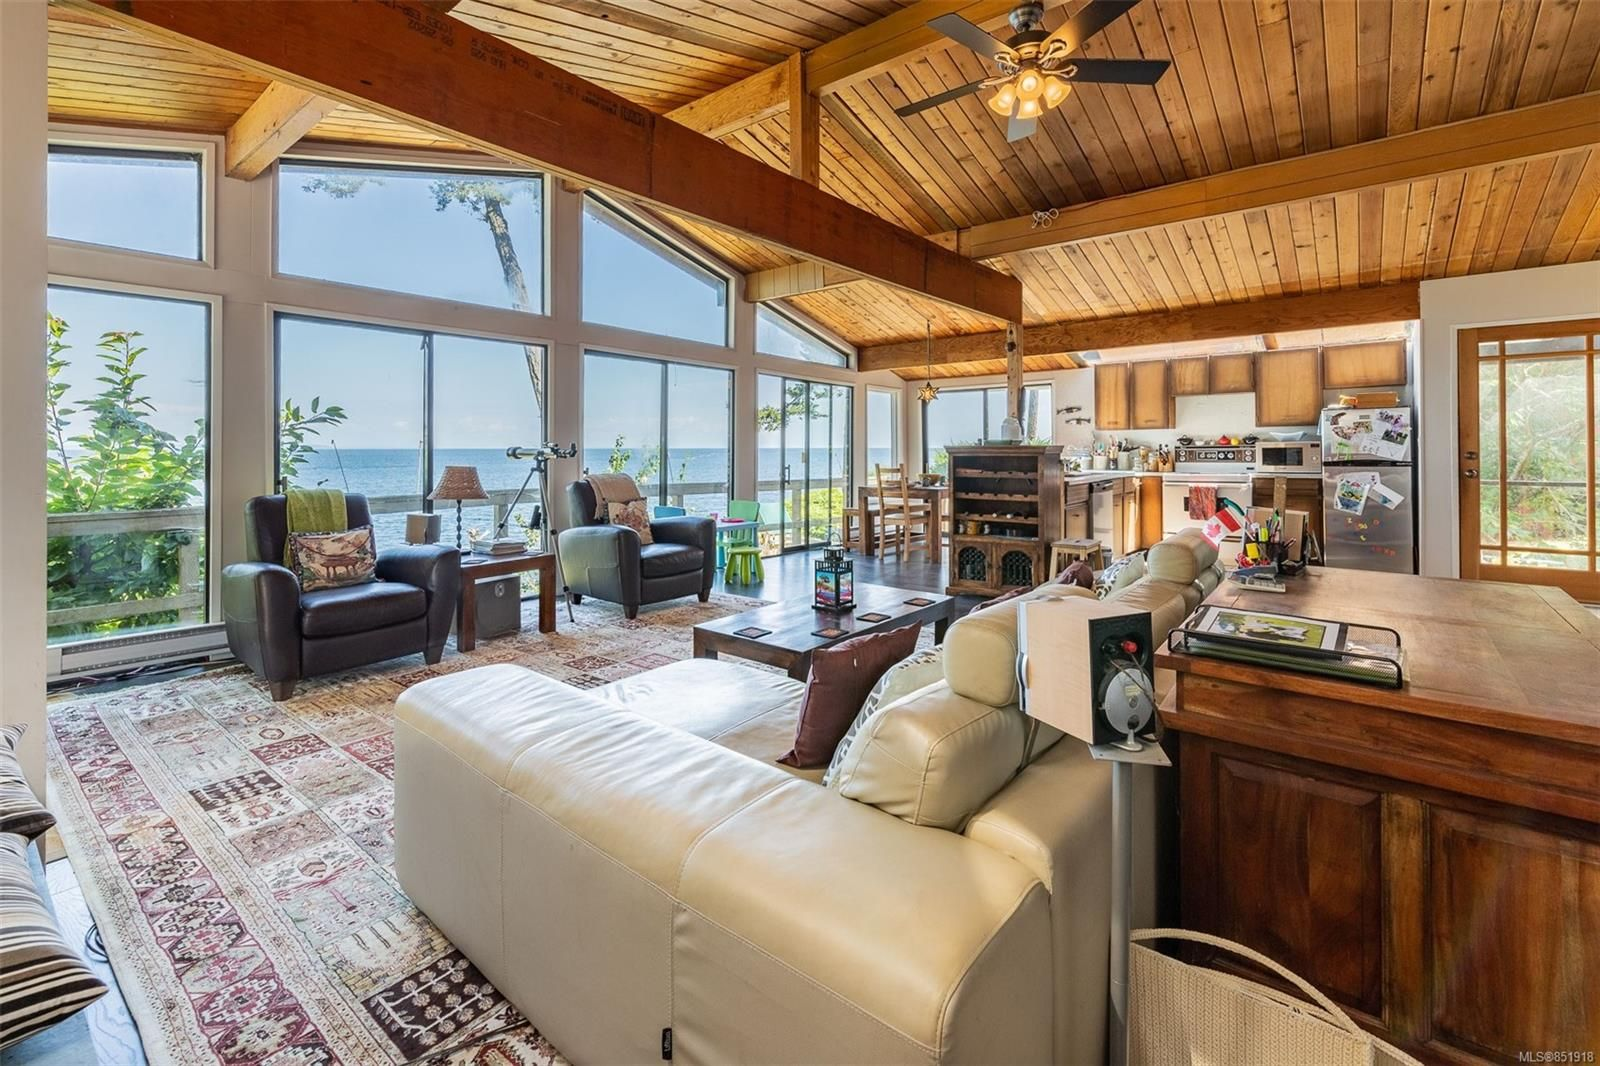 Main Photo: 567 Bayview Dr in : GI Mayne Island House for sale (Gulf Islands)  : MLS®# 851918